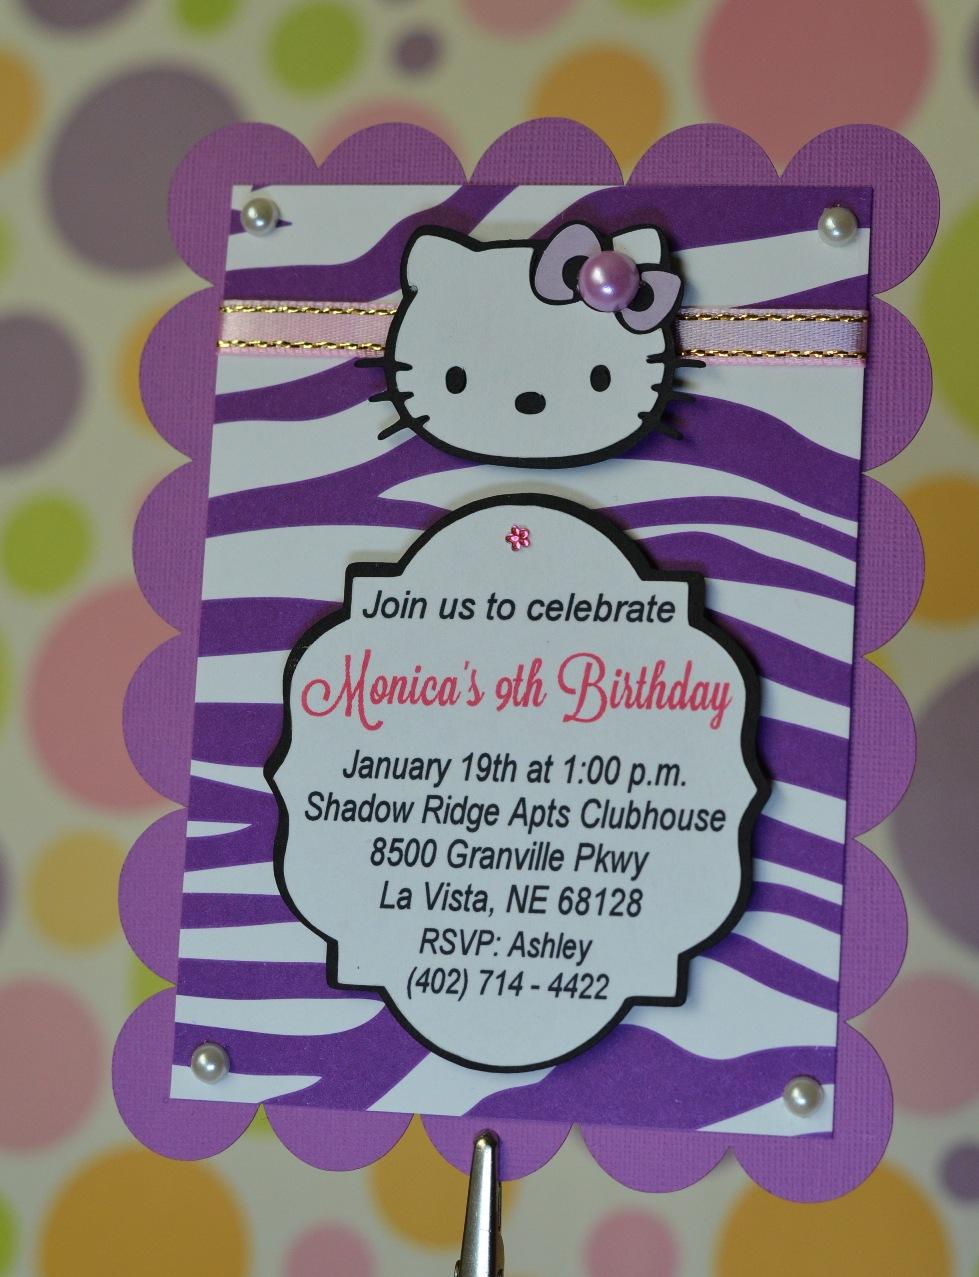 Scrapbook ideas hello kitty - Despicable_me Monions Disney_planes Disney_cars Monster_inc Invitations